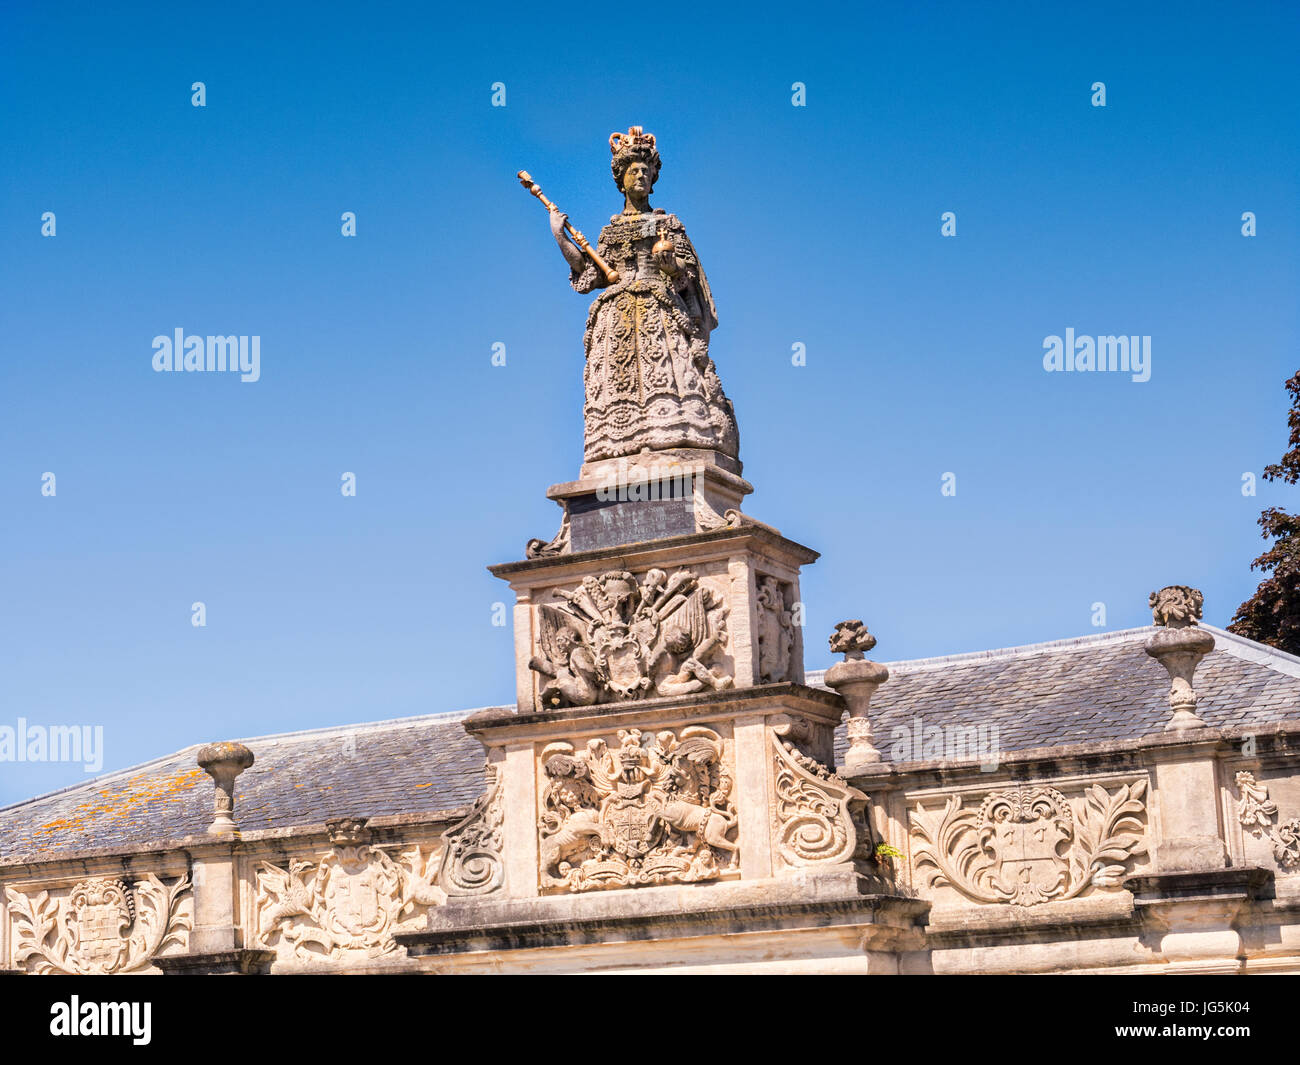 Statue of Queen Anne at Queen Anne's Walk, formerly the Mercantile Exchange, Branstaple, Devon, England, UK. - Stock Image